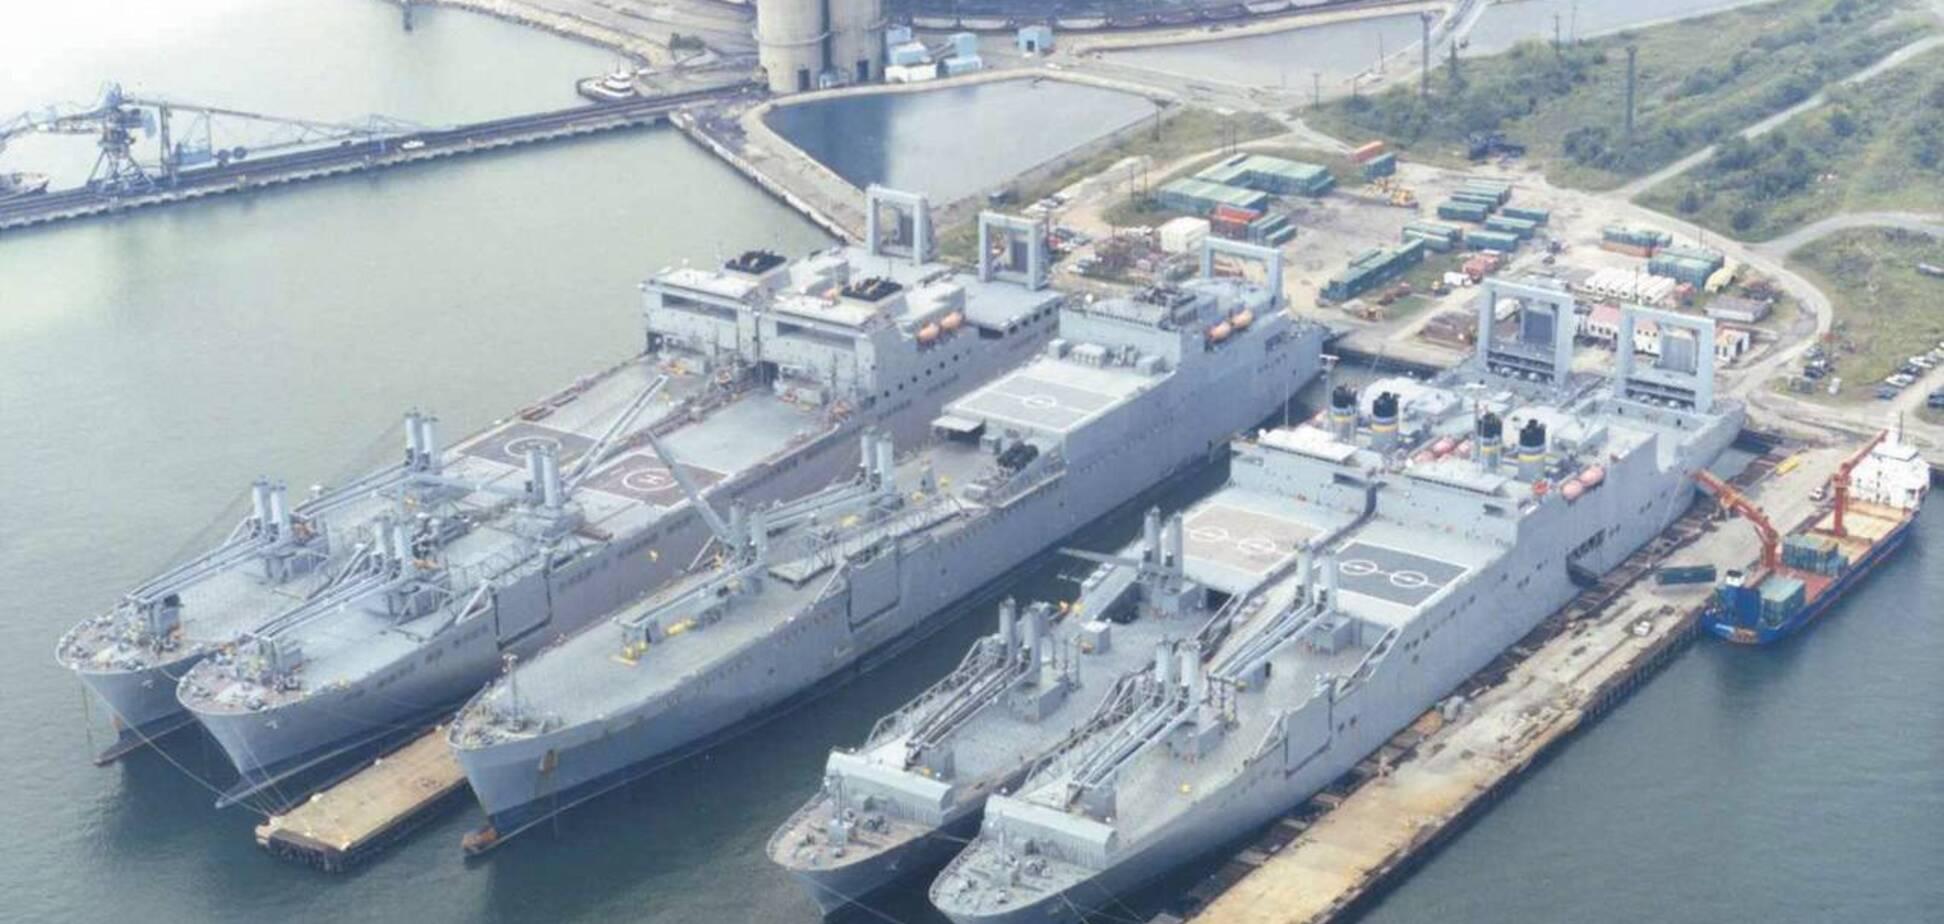 Спалах конфлікту з РФ на морі: адмірал застеріг Україну